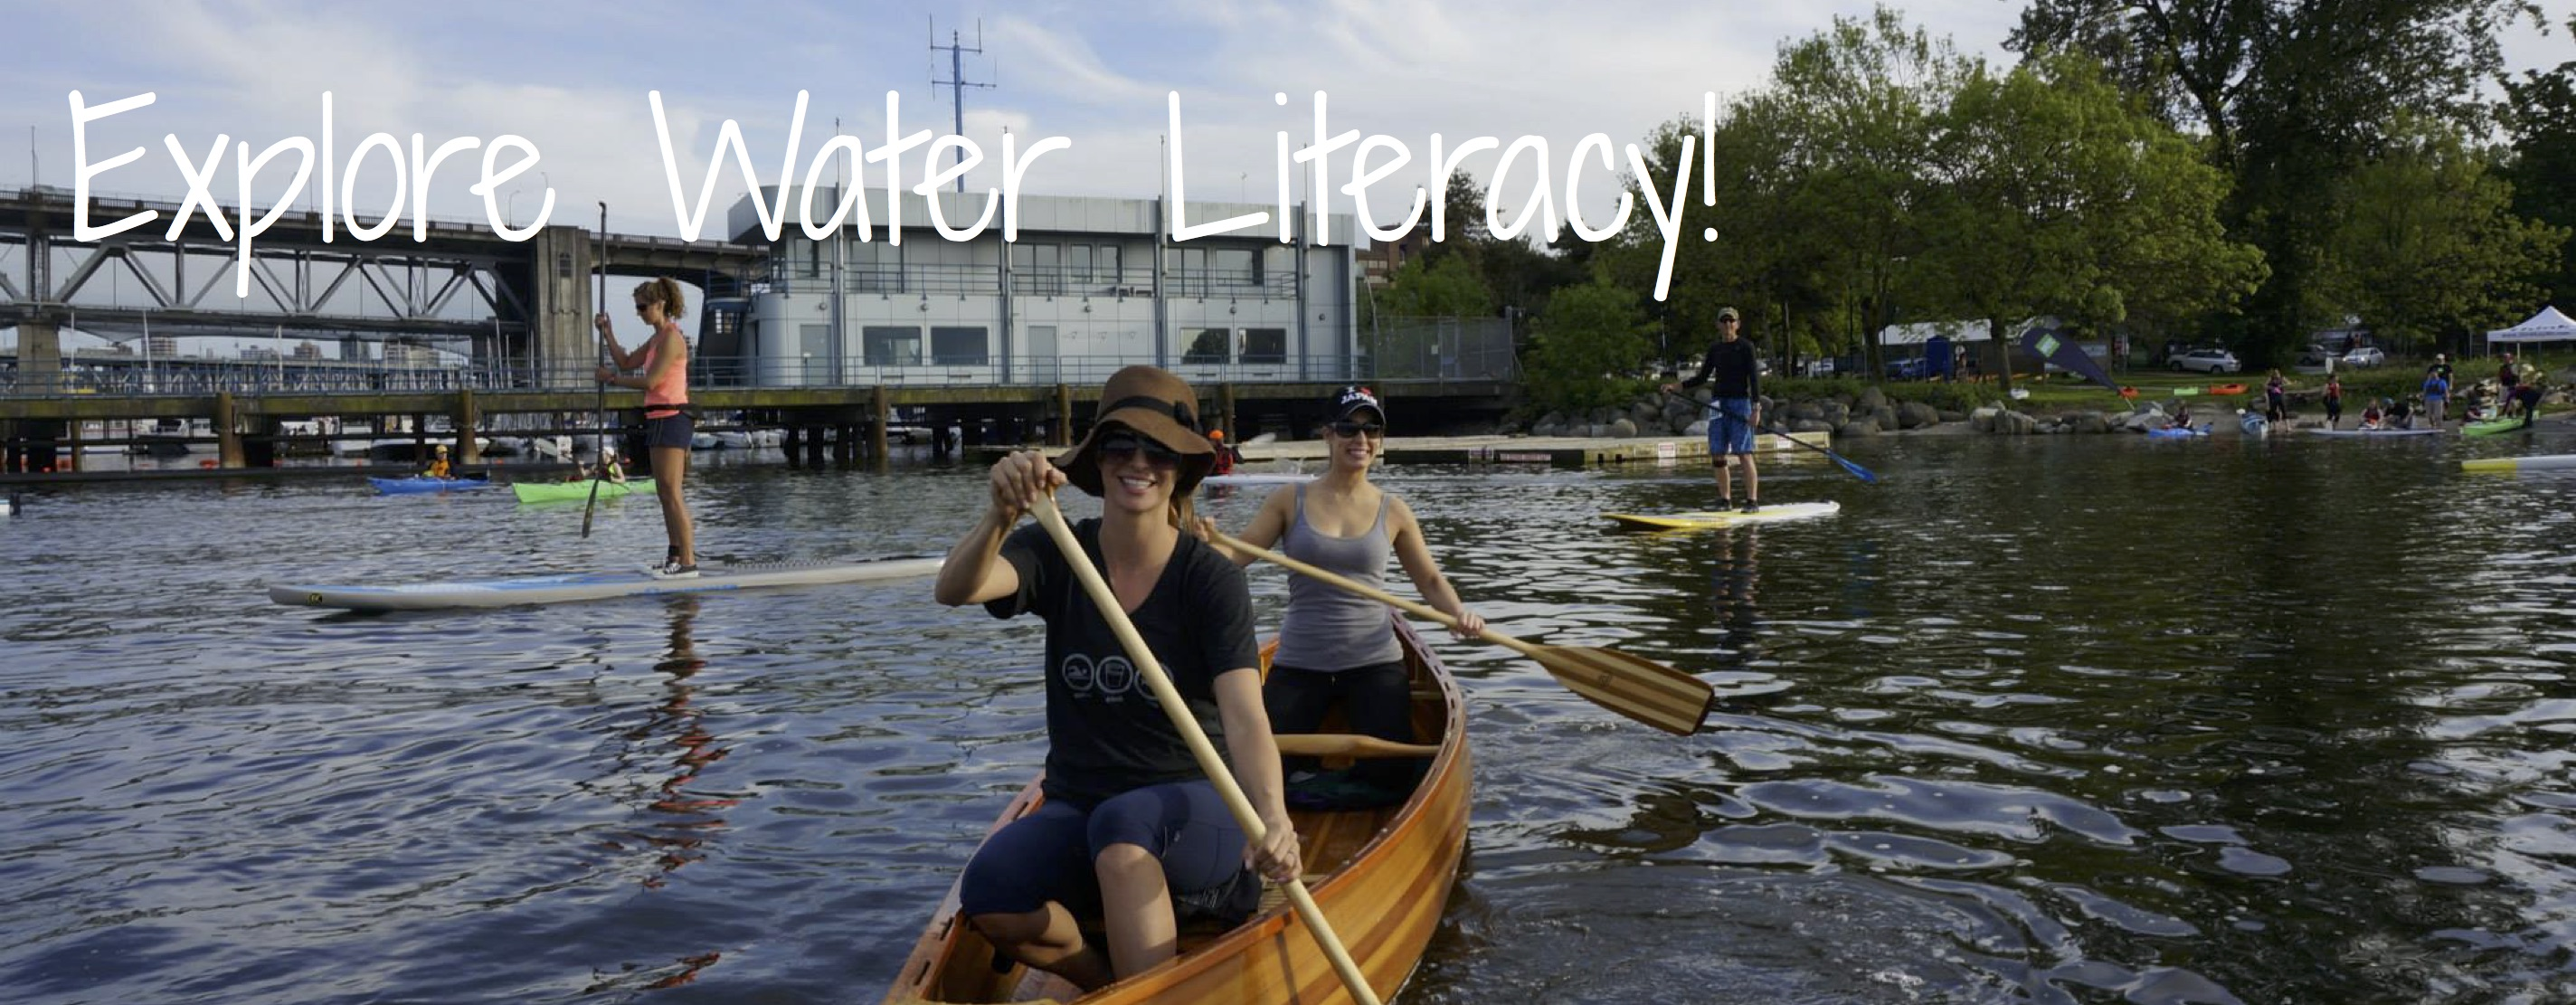 Explore-Water-Literacy.jpg